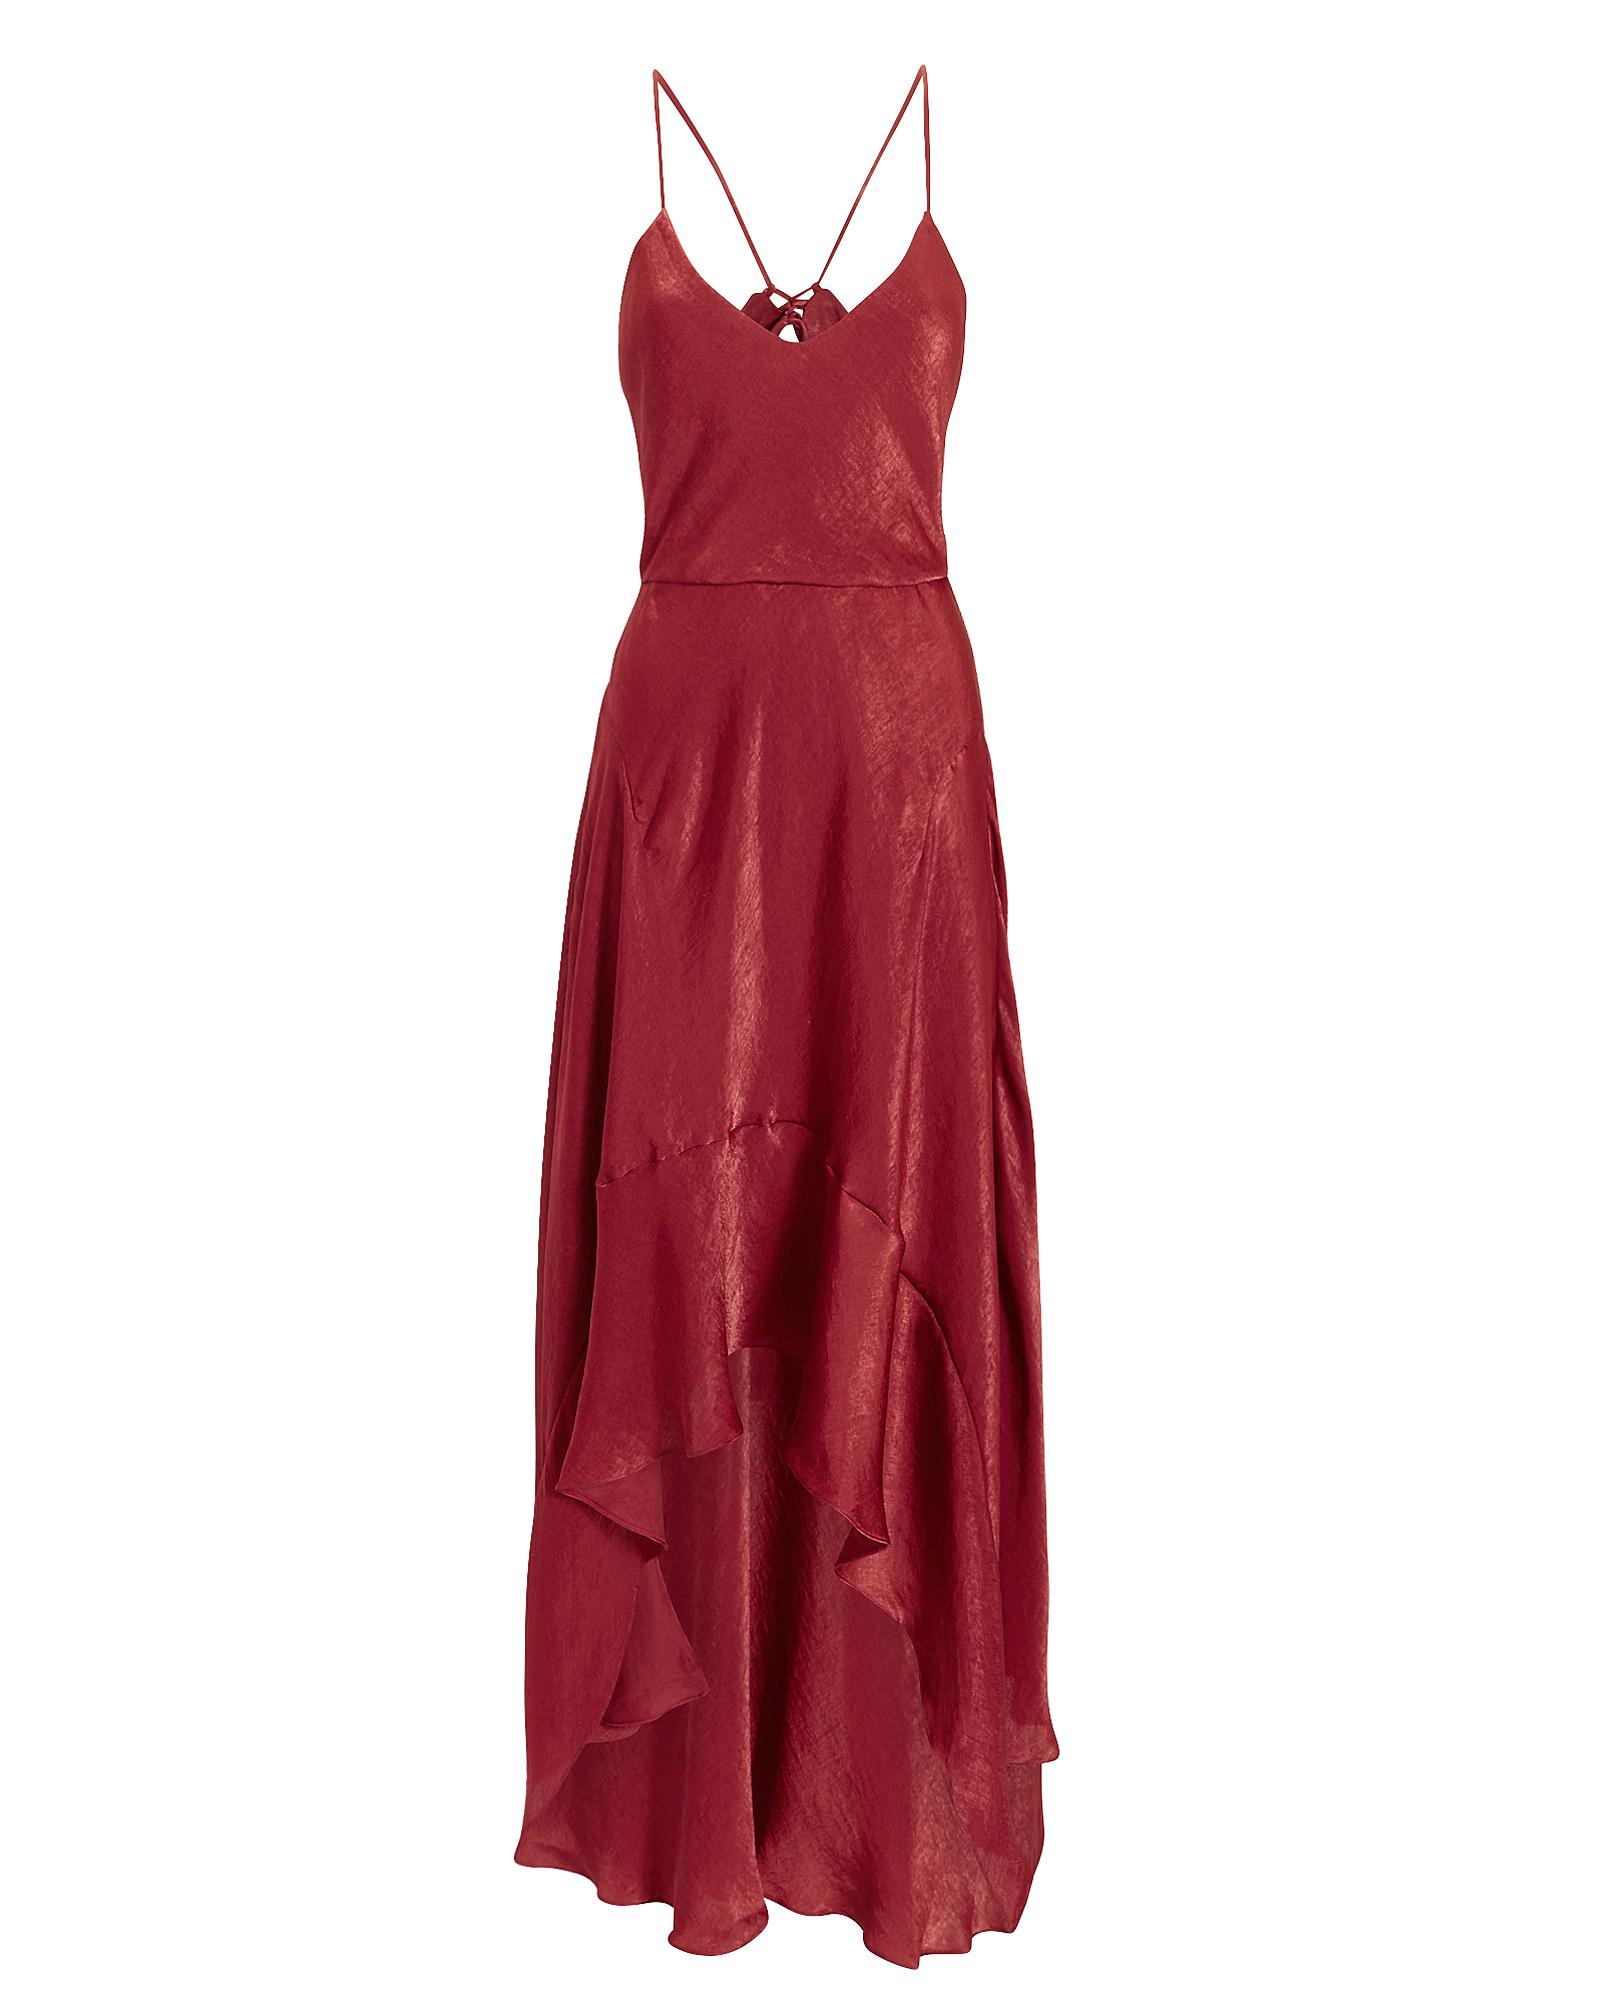 ESTEBAN CORTAZAR Tie Back Slip Dress